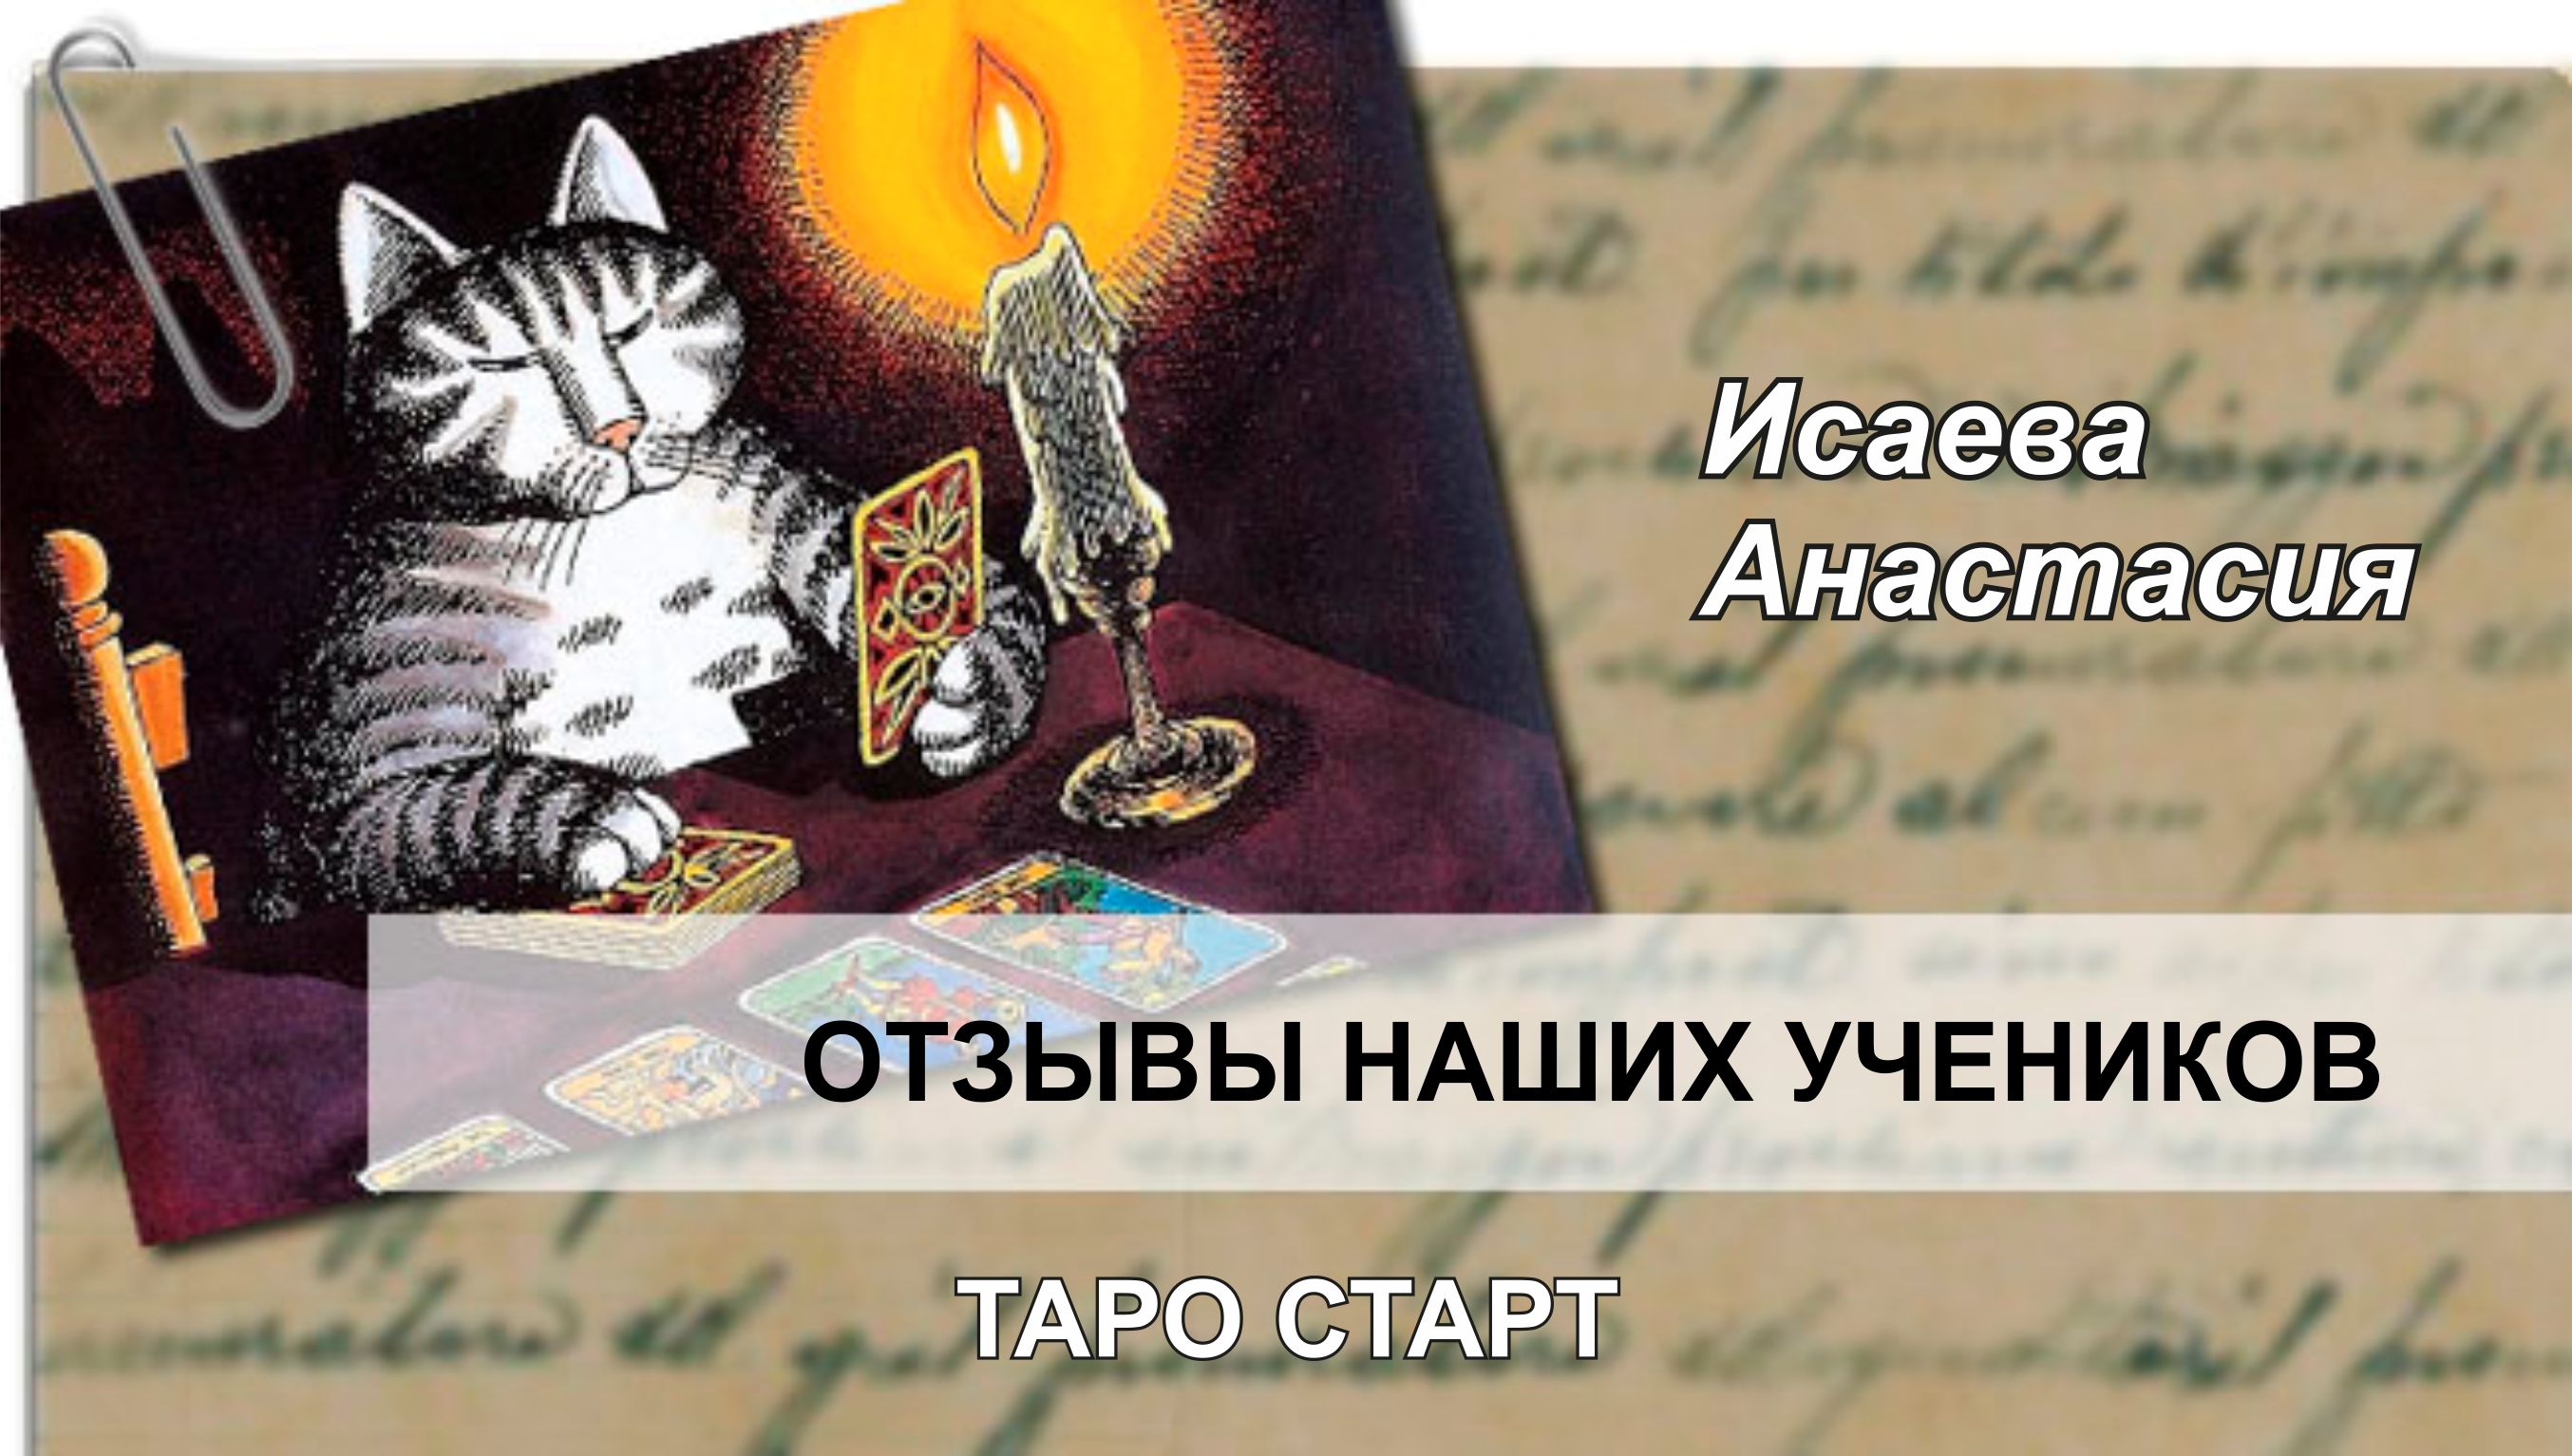 Исаева Анастасия отзыв Таро Старт